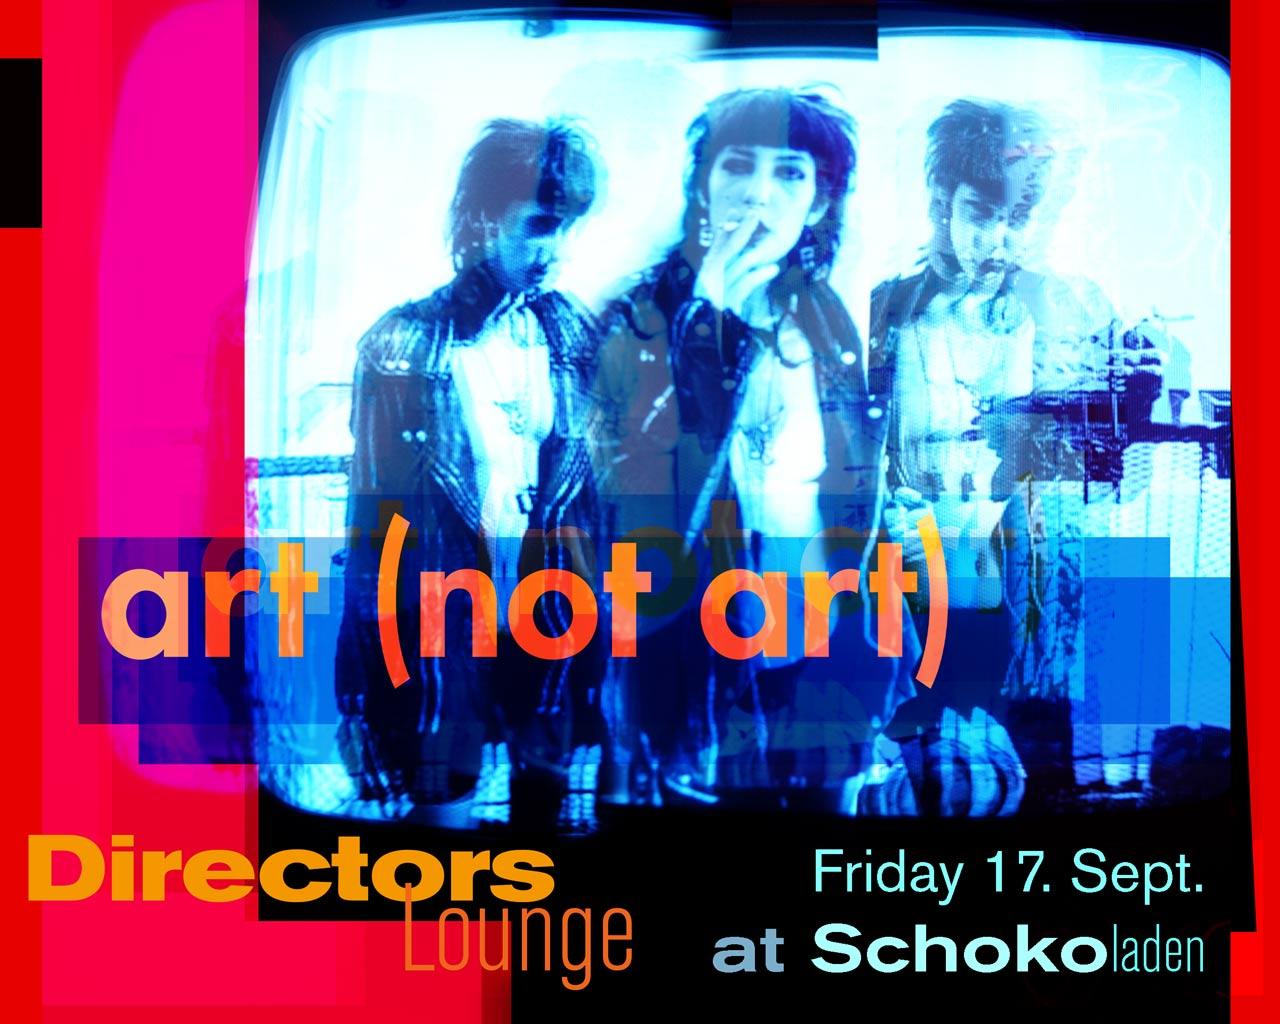 Directors Lounge at the 10th Berlin Art Week.